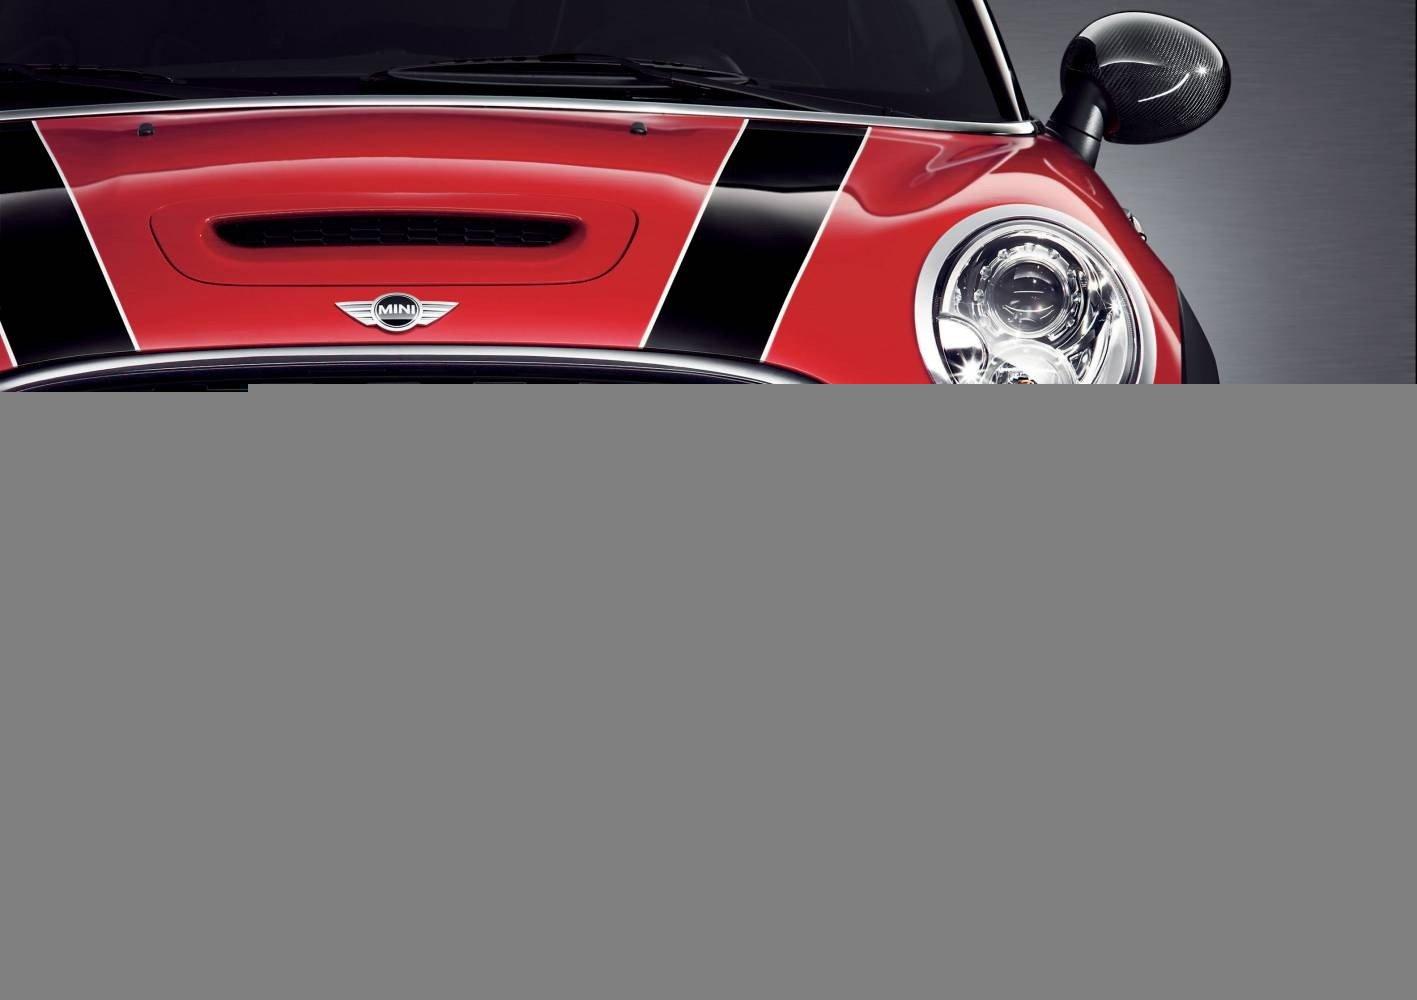 MINI Genuine JCW Front Left Bumper Extension Black R55 R56 R57 51110441461